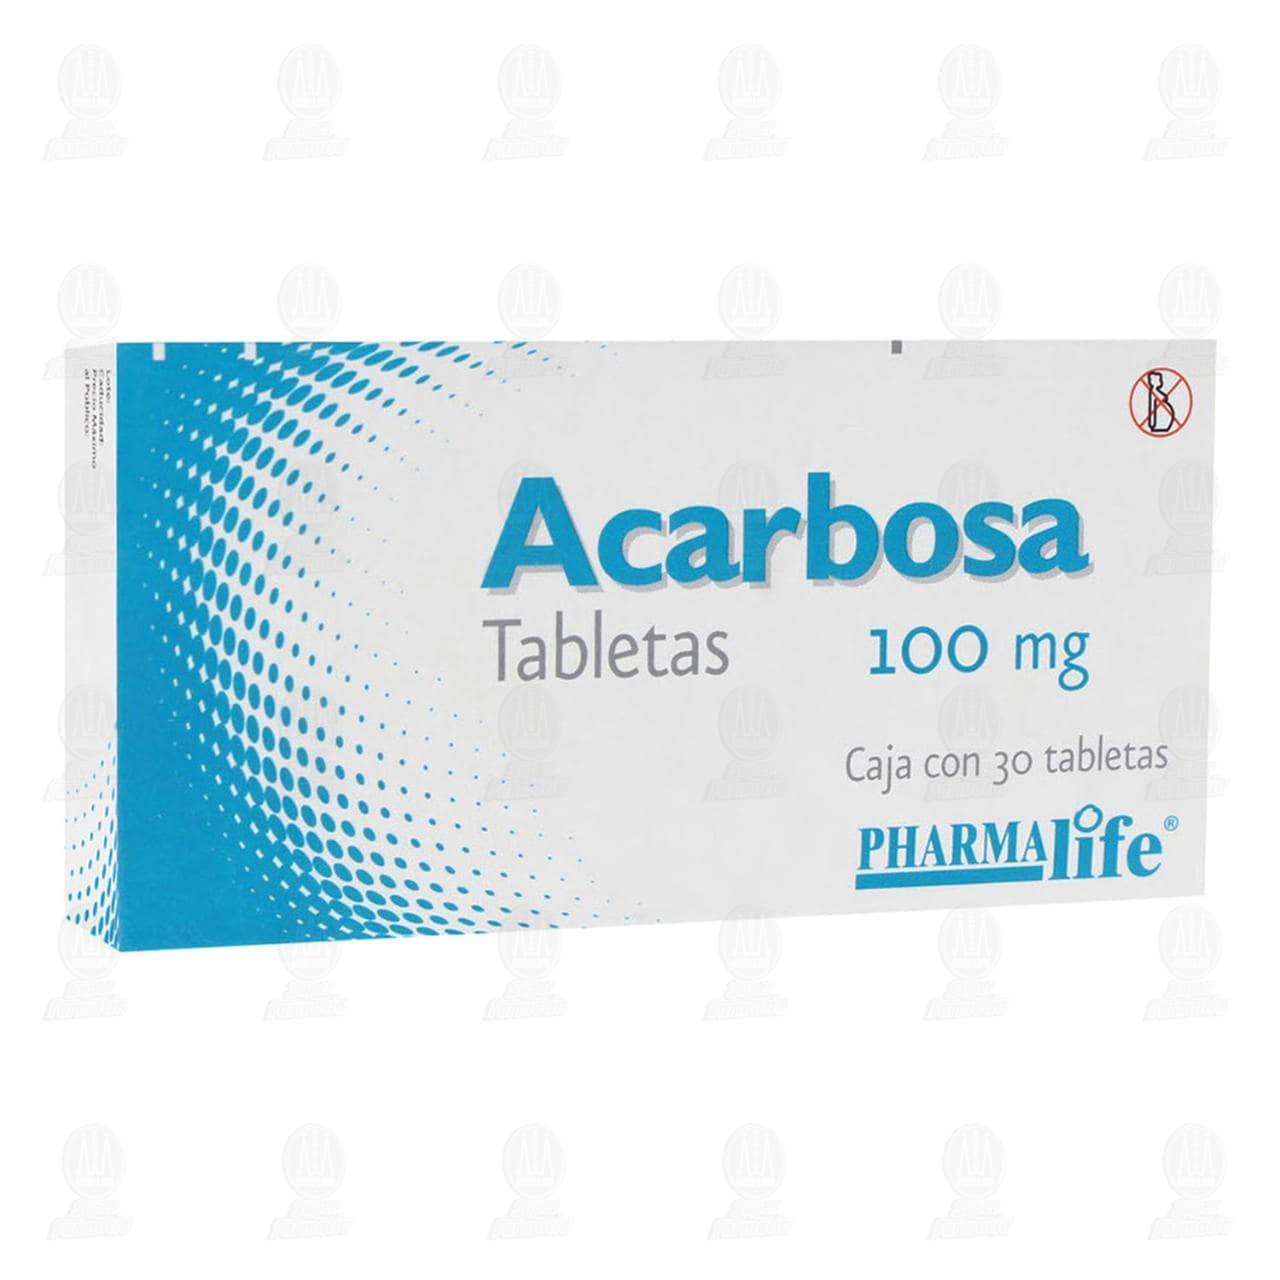 Comprar Acarbosa 100mg 30 Tabletas Pharmalife en Farmacias Guadalajara